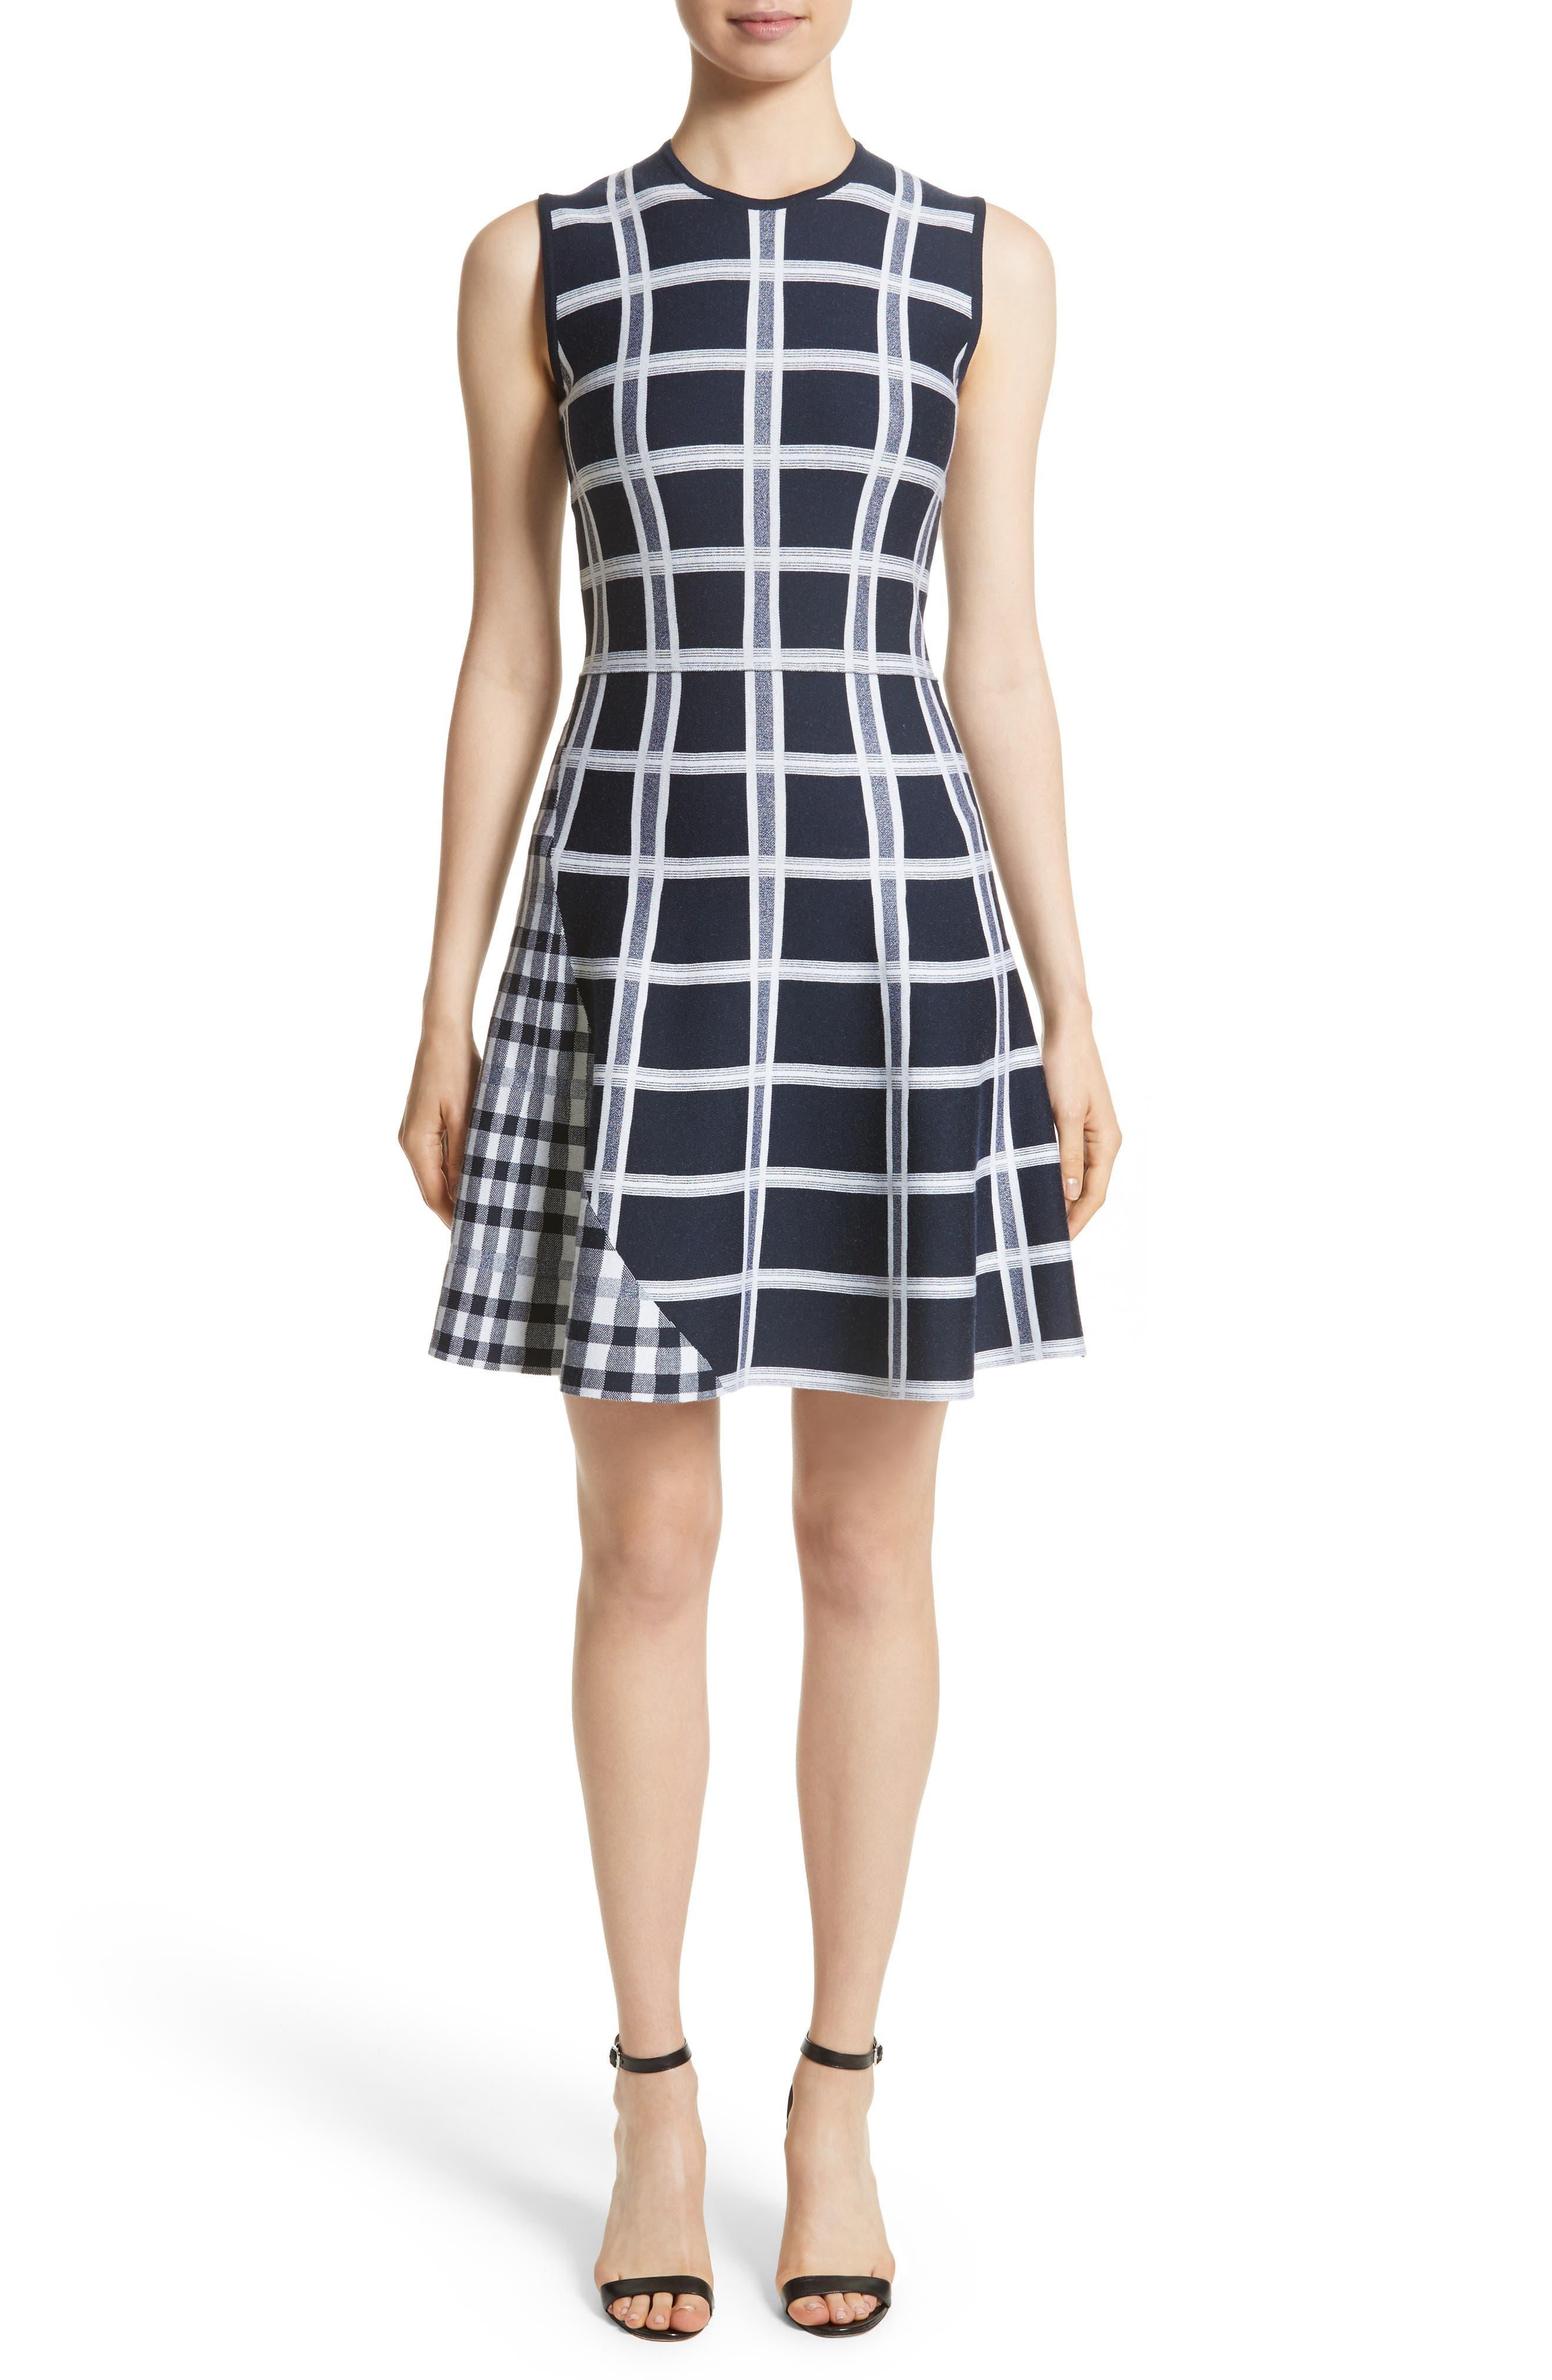 Victoria Beckham Intarsia Tartan Check Dress